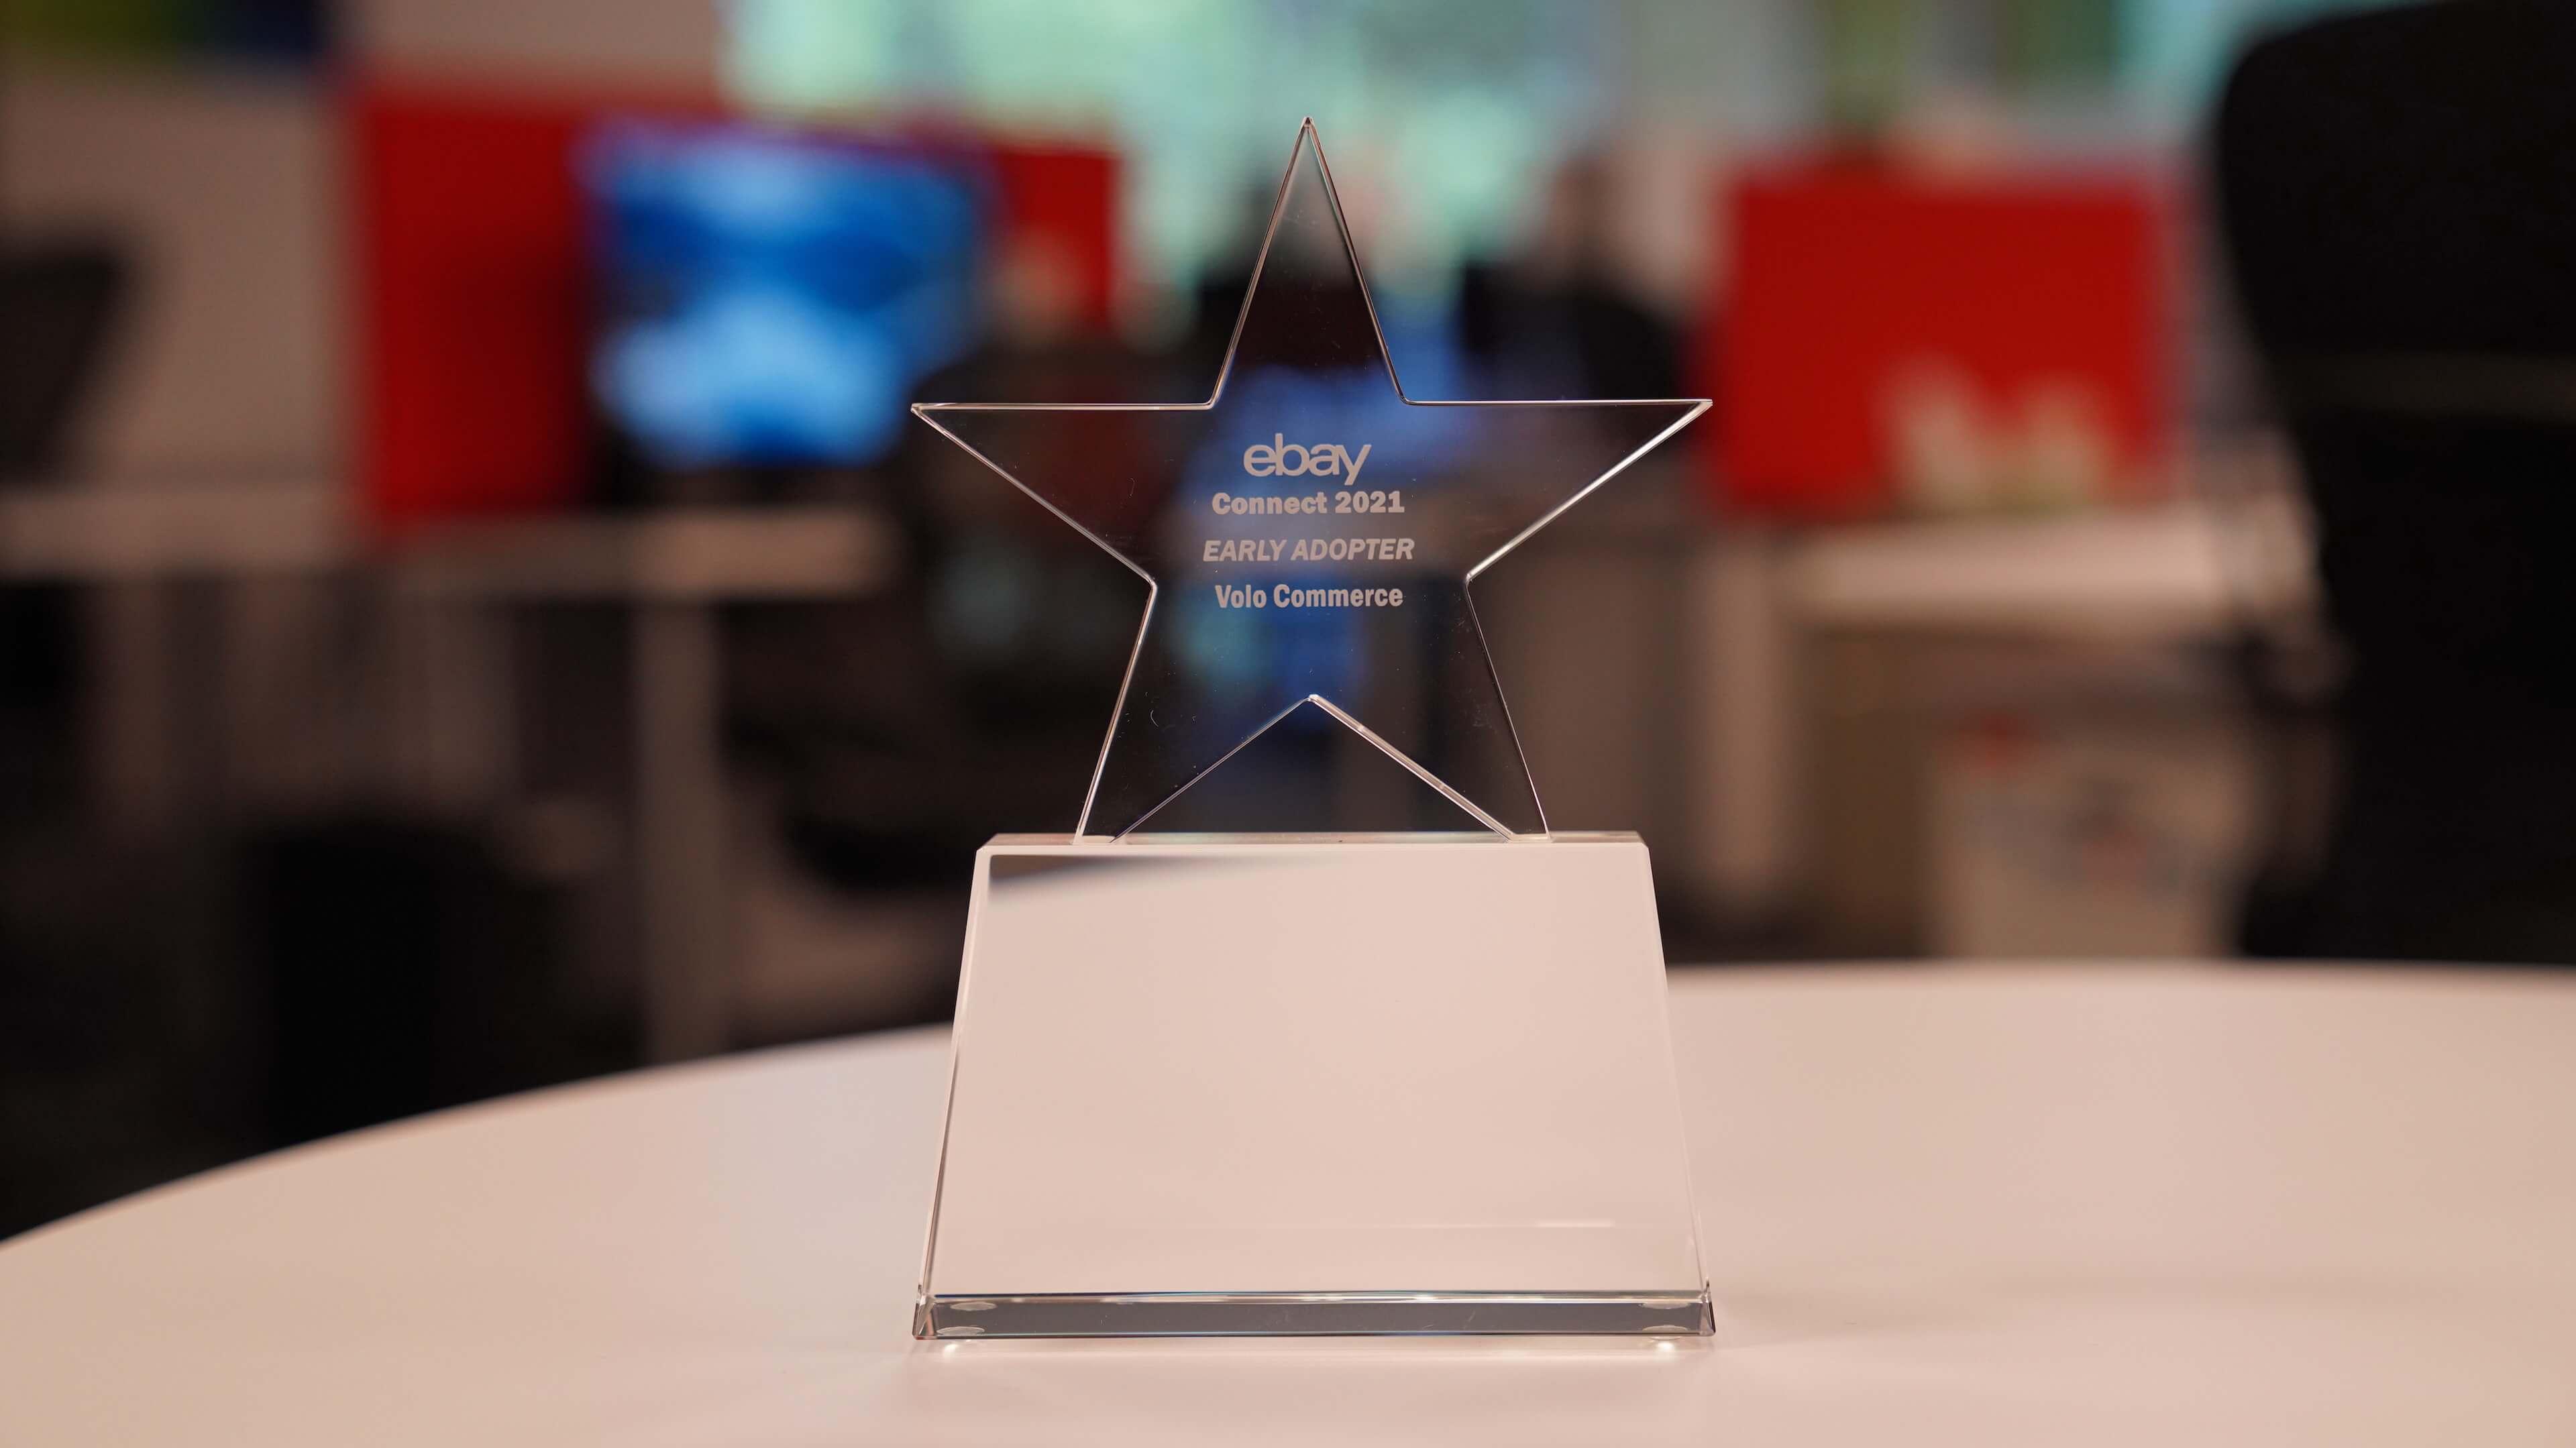 Early Adopter Award